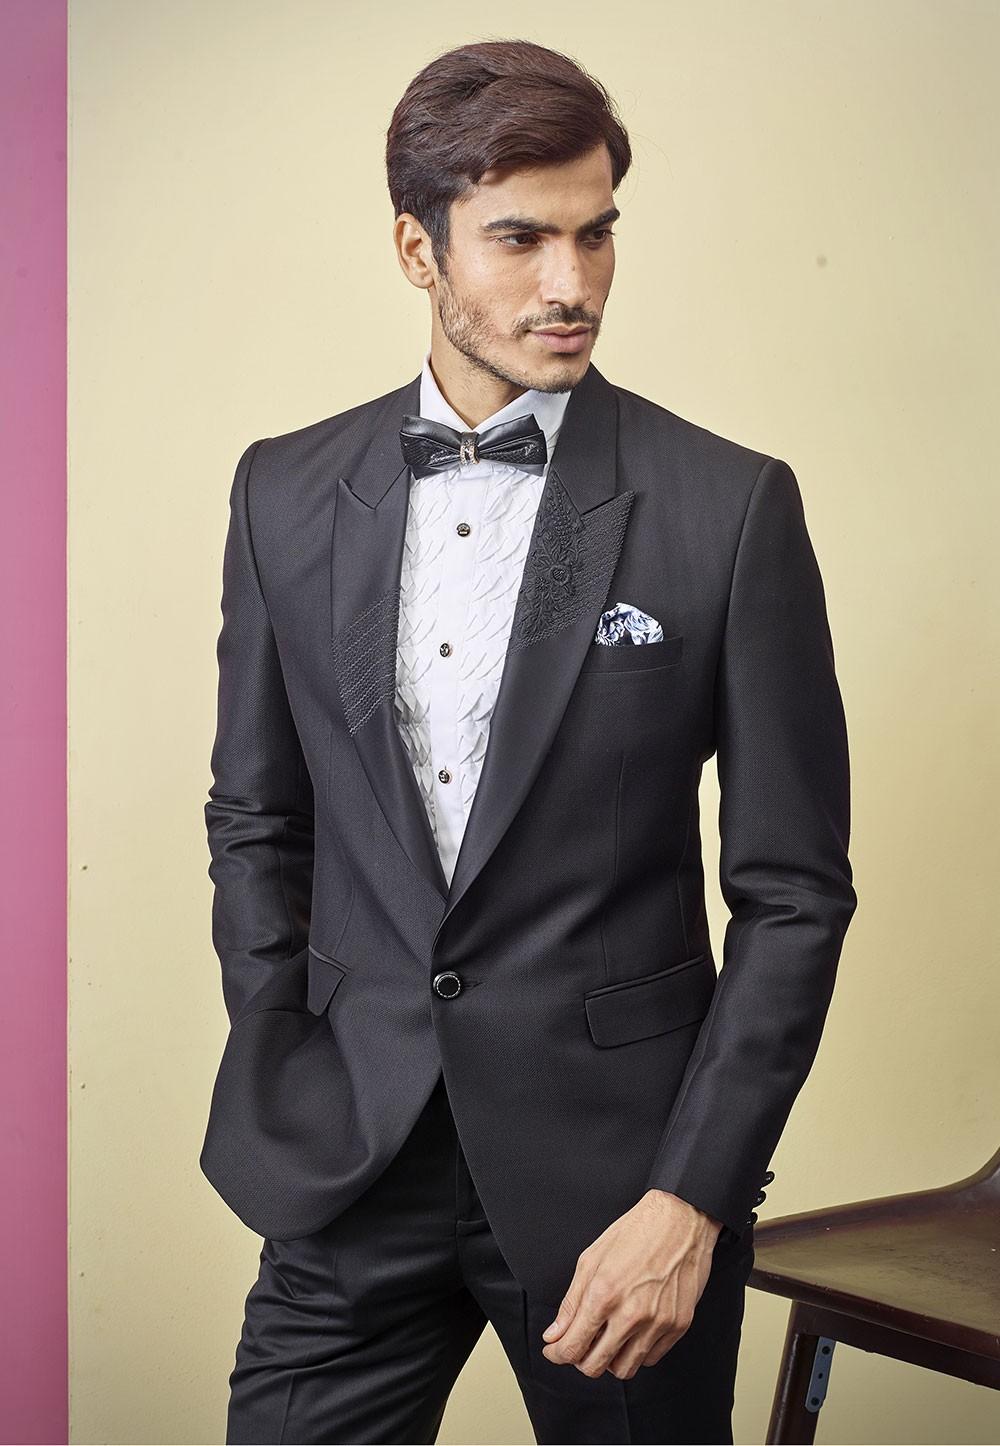 Best Wedding Suits for Men in Dashing Black